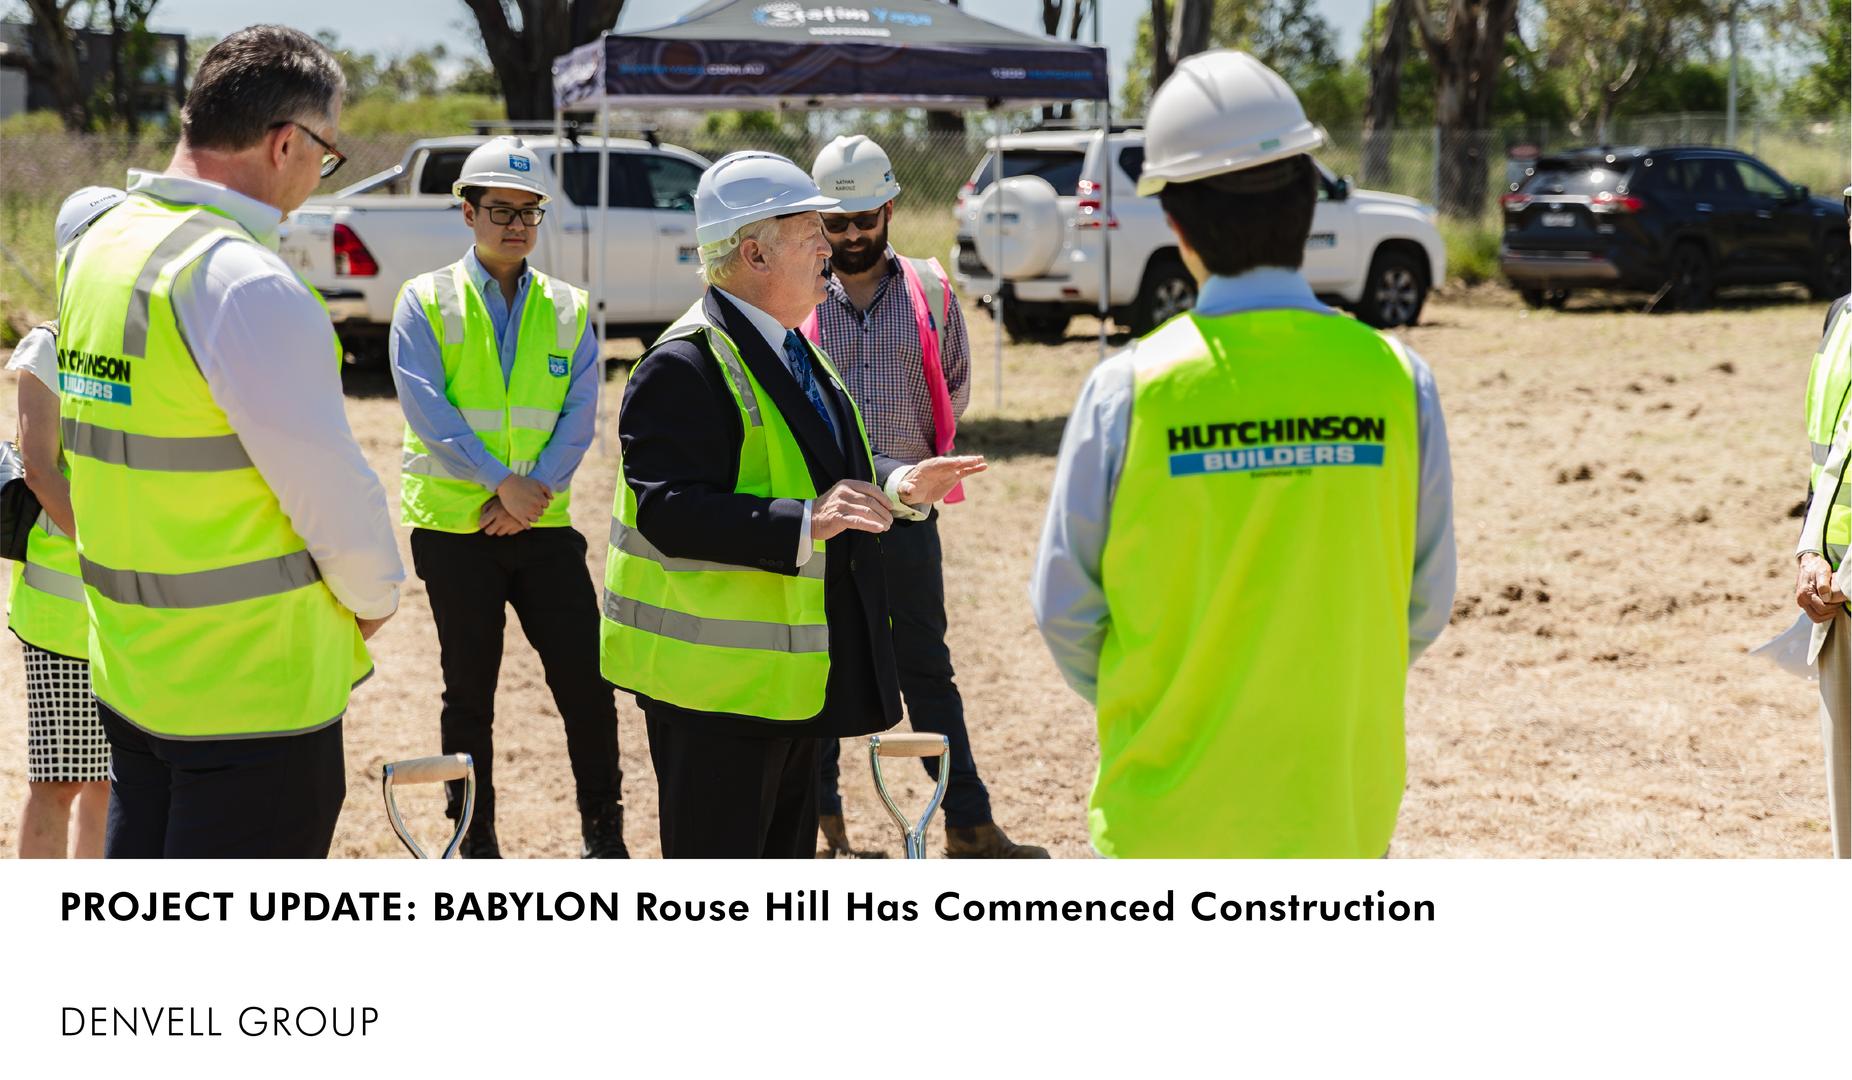 Hutchinson Builders Babylon Rouse Hill